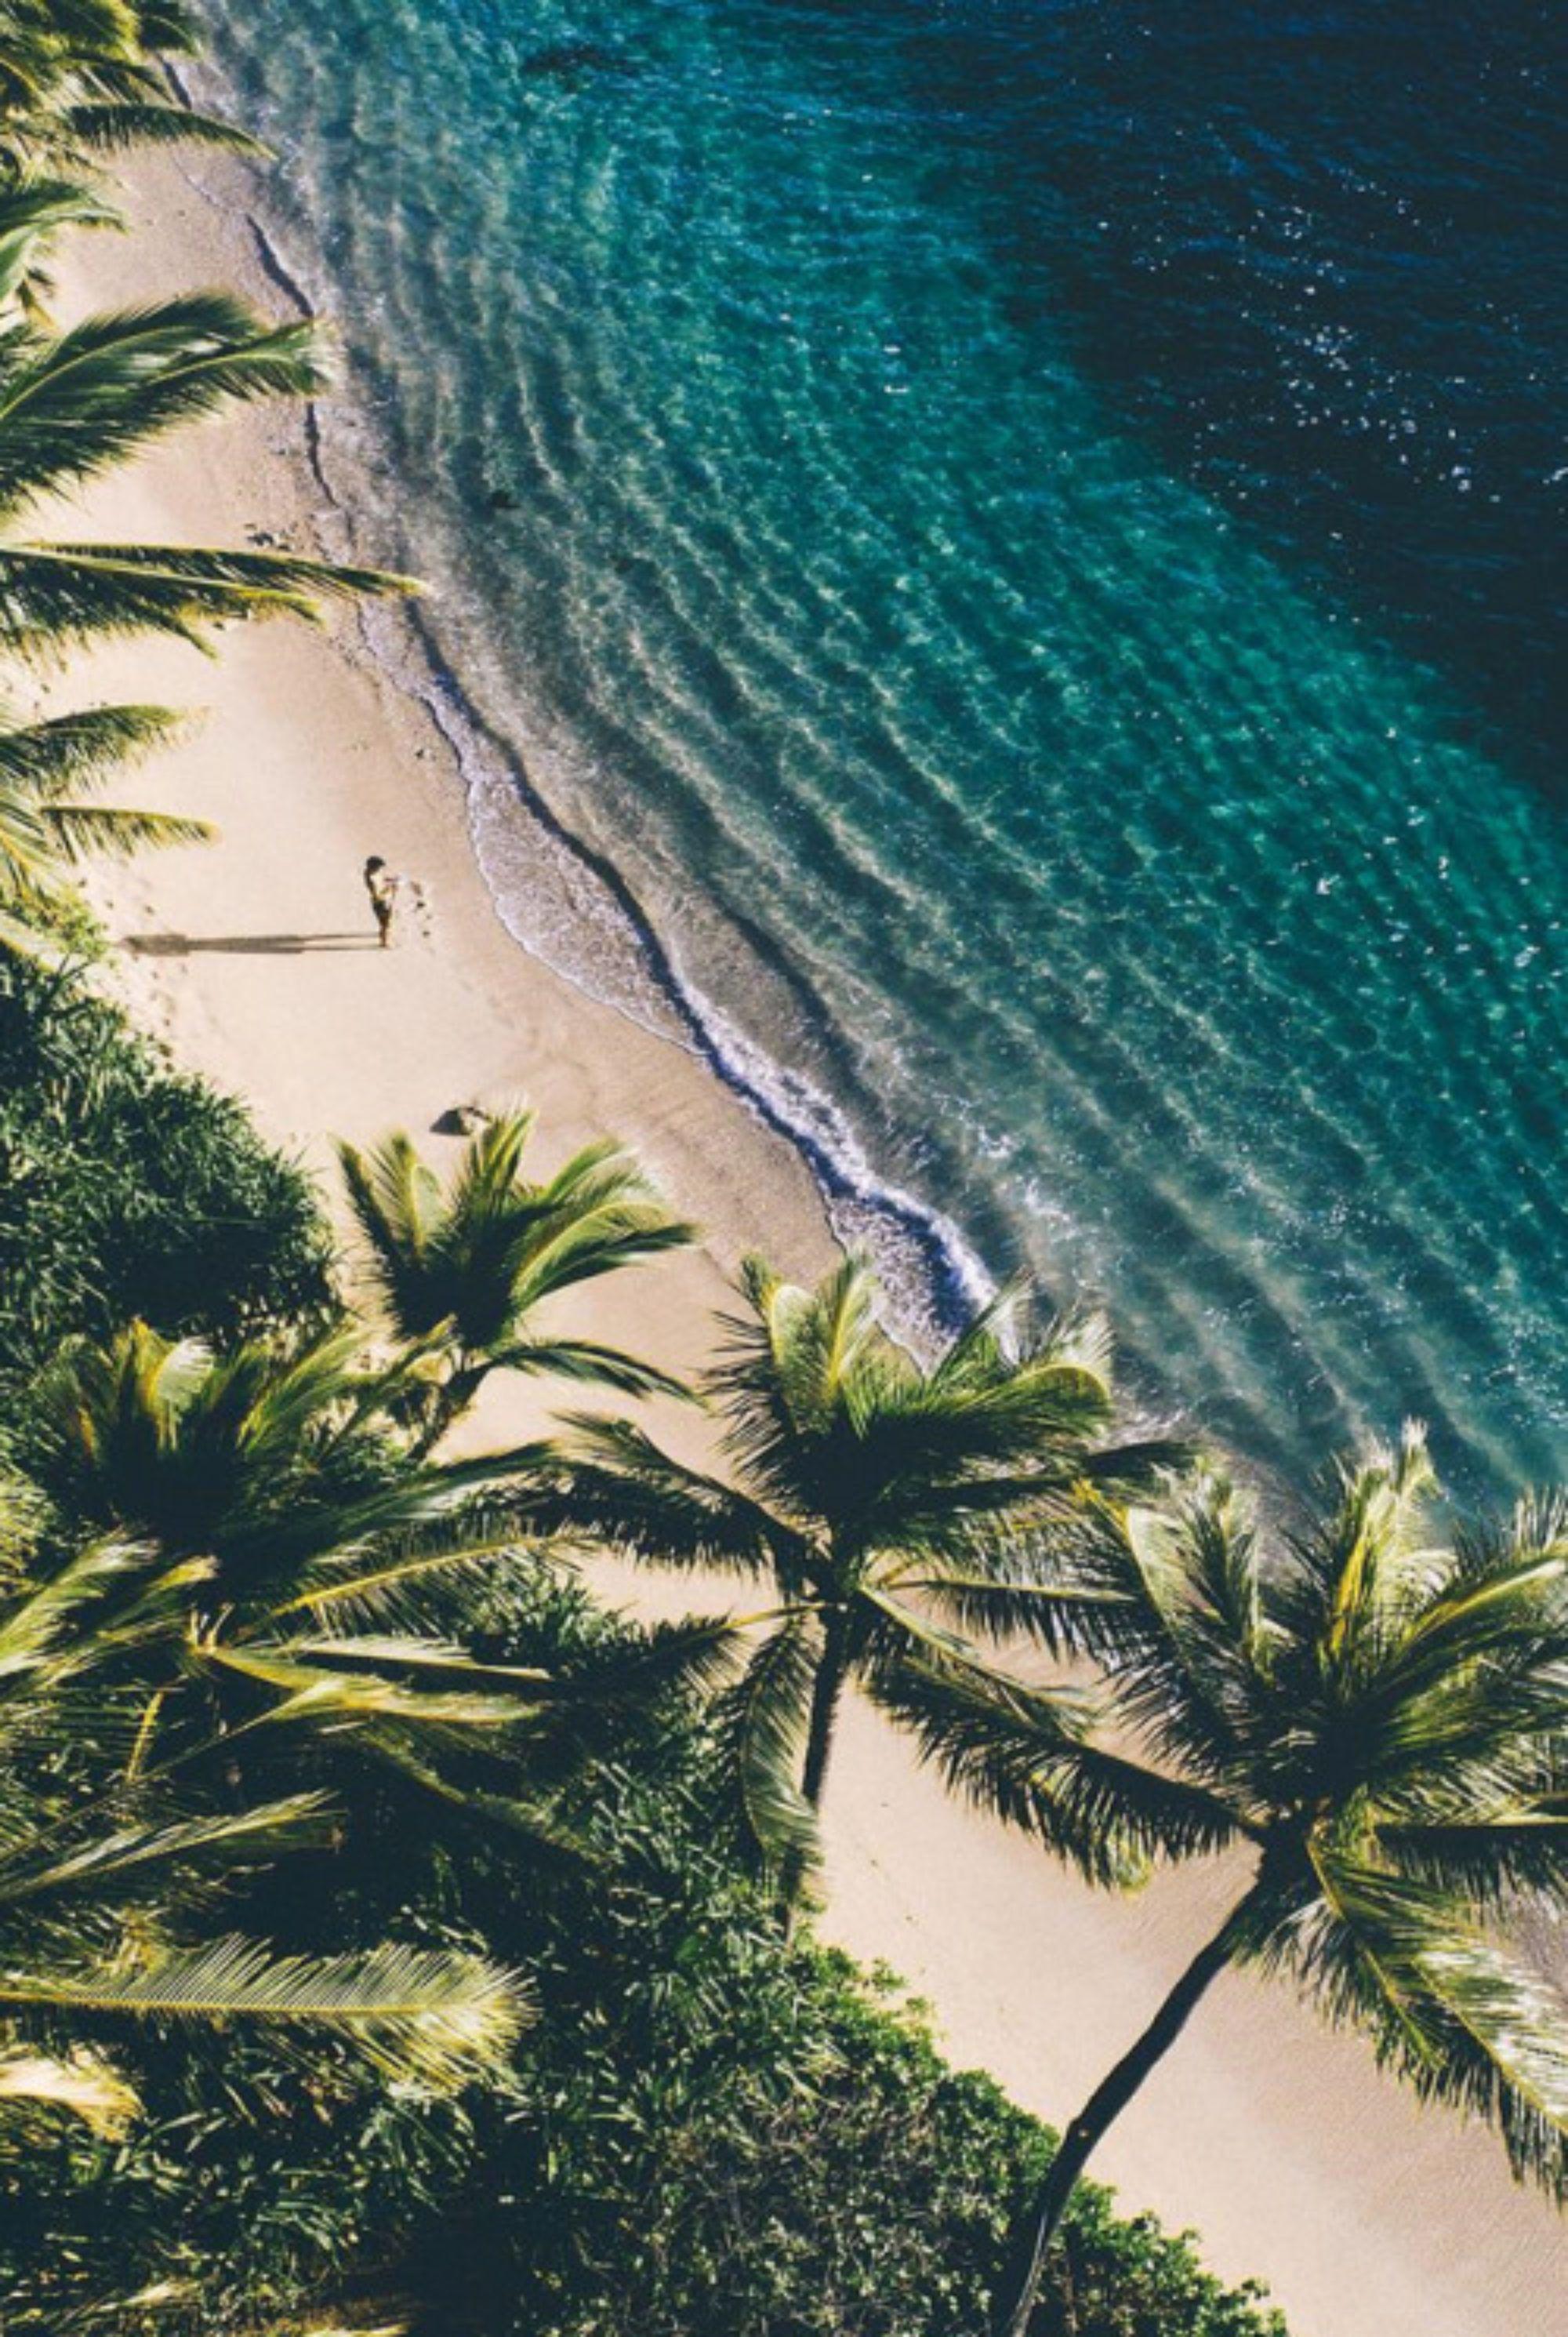 """palm trees wallpaper iphone""的图片搜索结果 Nature photography"